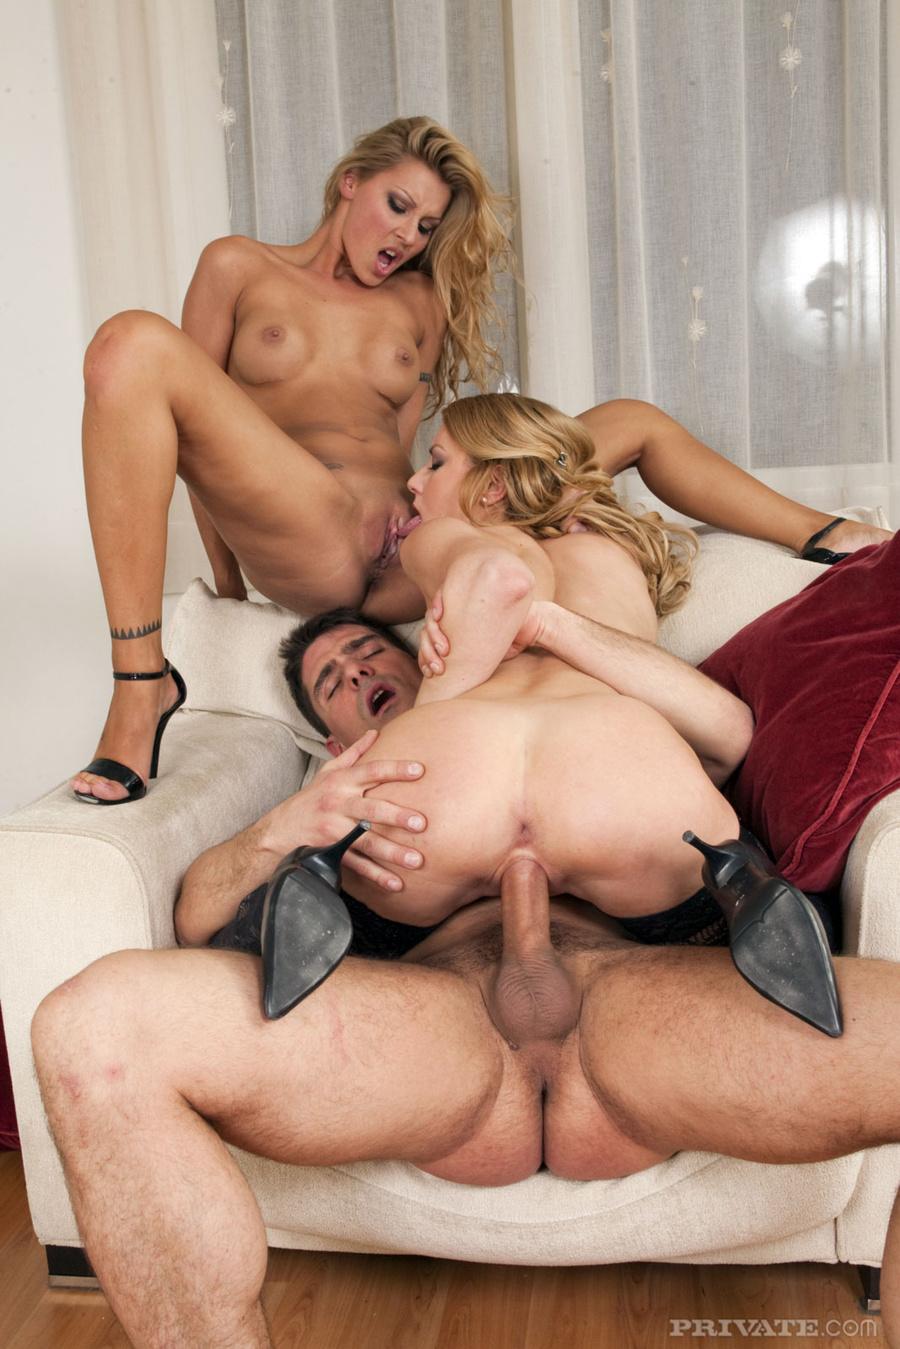 xxx-ful-sex-images-nude-emo-chicks-fucking-hardcore